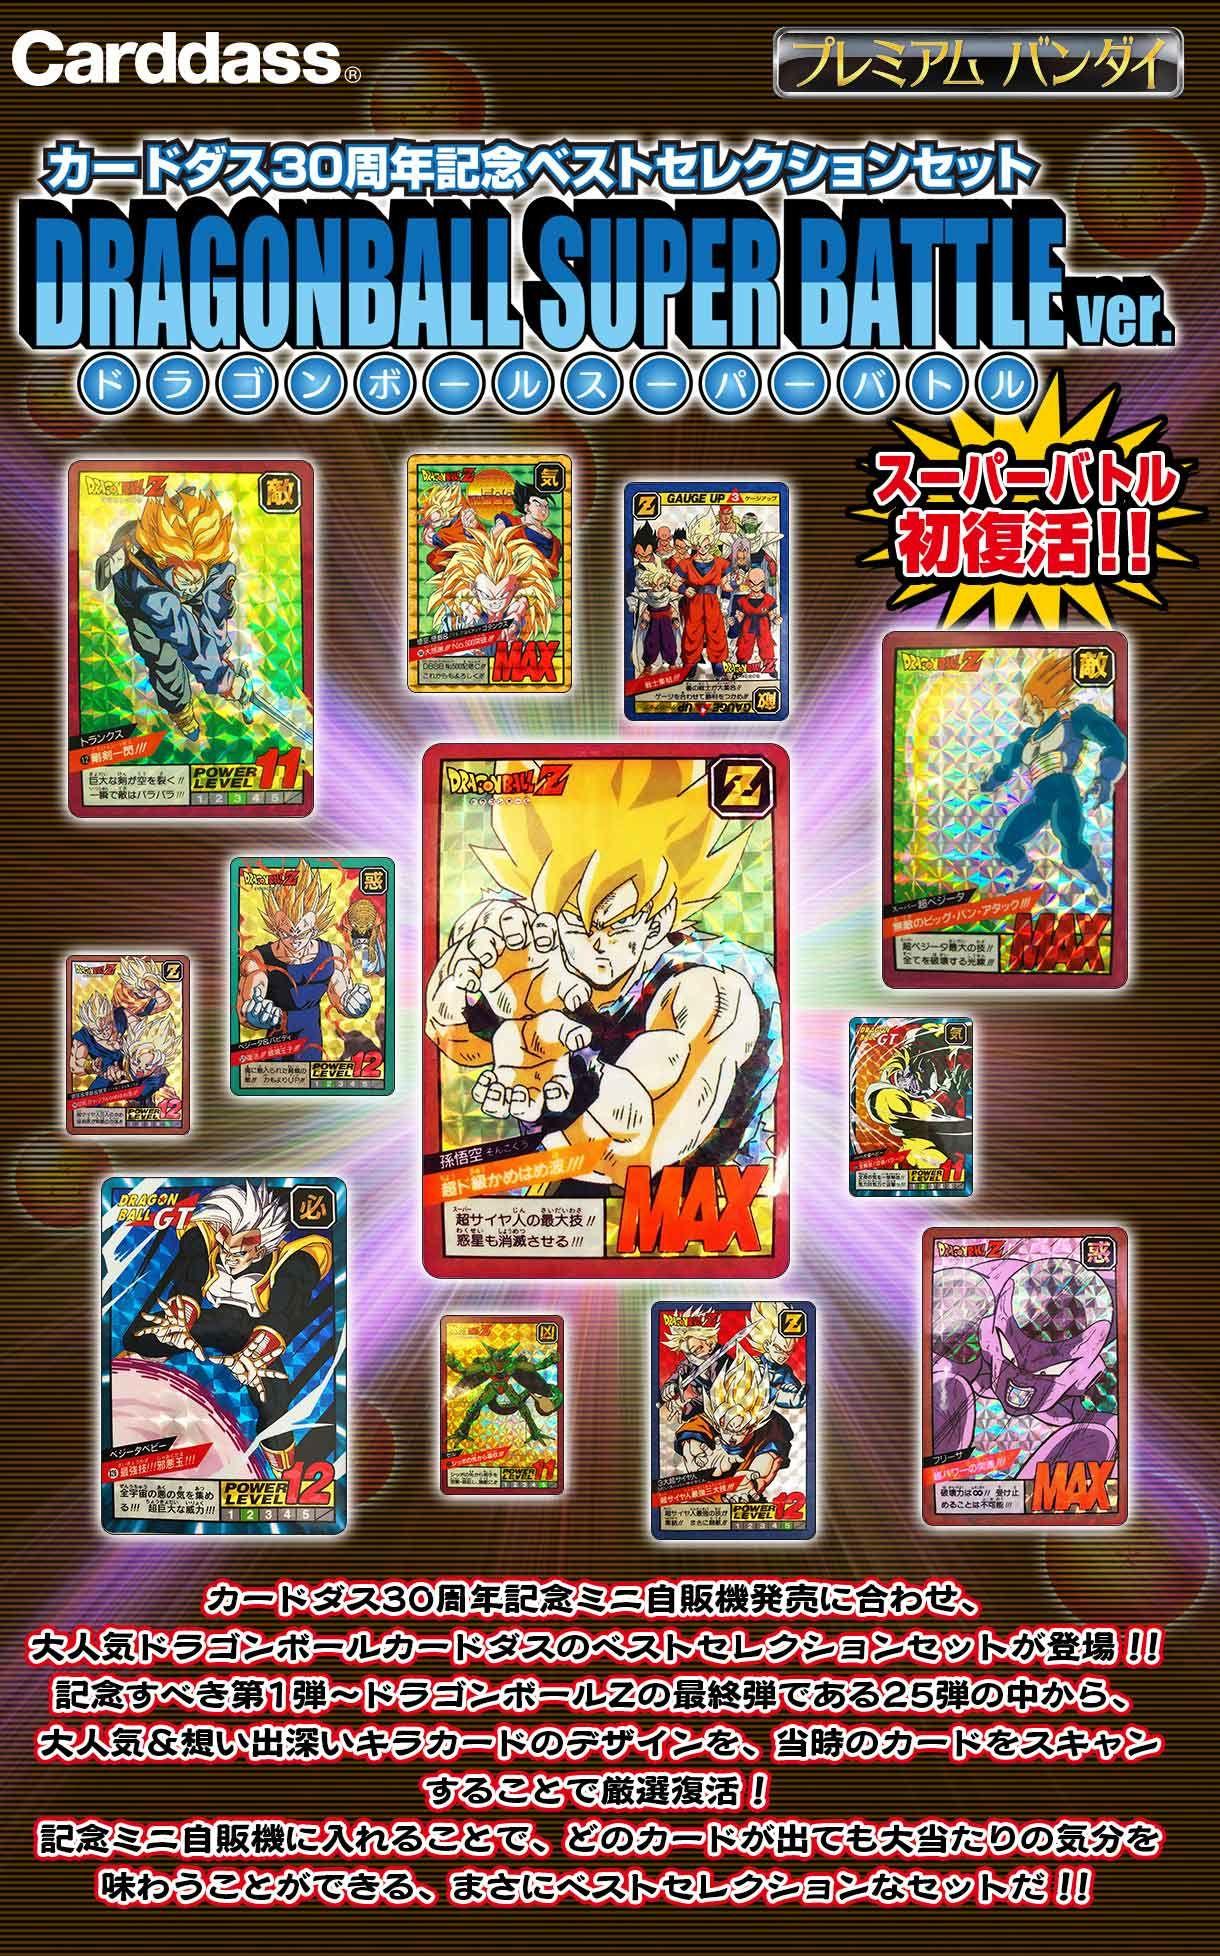 Carddass 30th Anniversary Best Selection Set Dragon Ball Super Battle ver 1